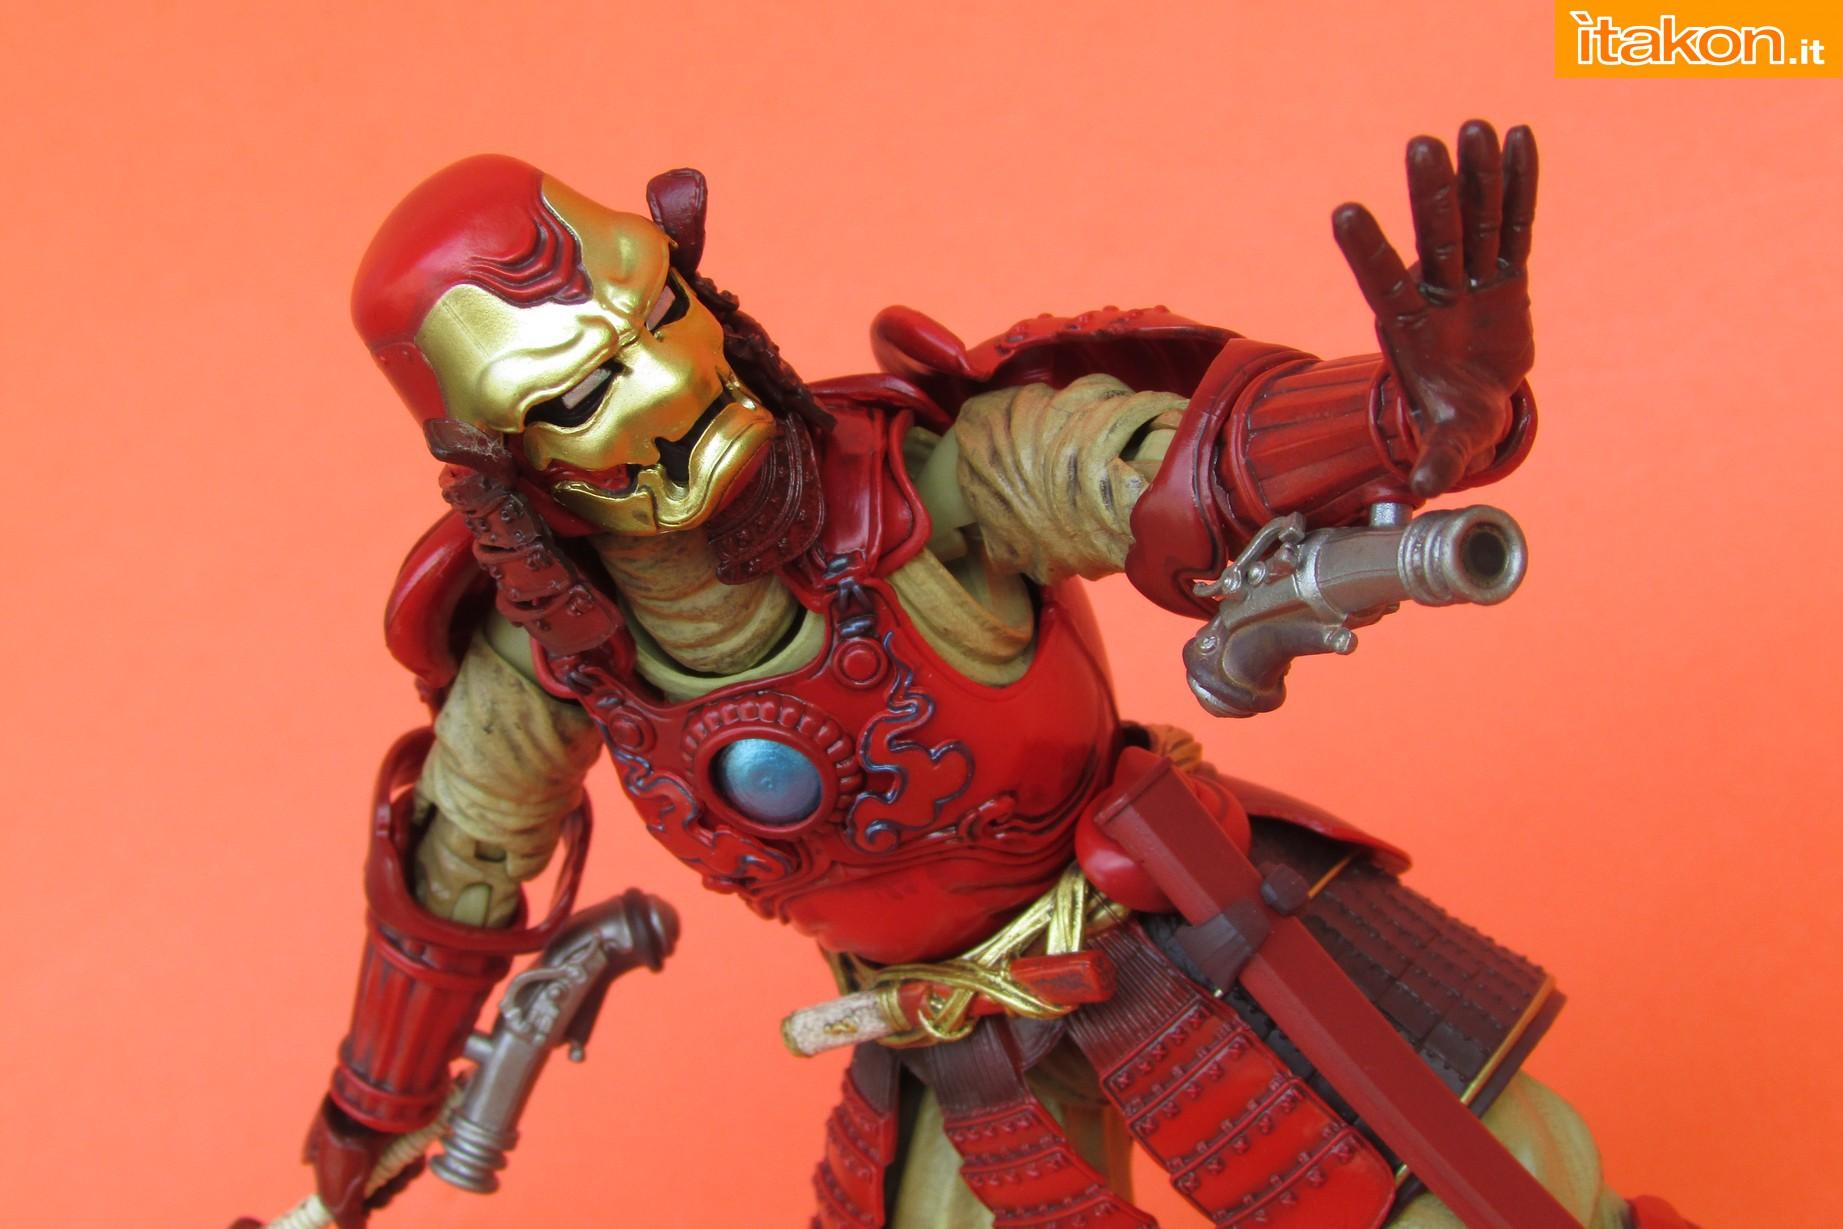 Link a Marvel Comics Koutetsu Samurai Iron Man Mark 3 Meishou MANGA REALIZATION review Bandai Itakon.it55